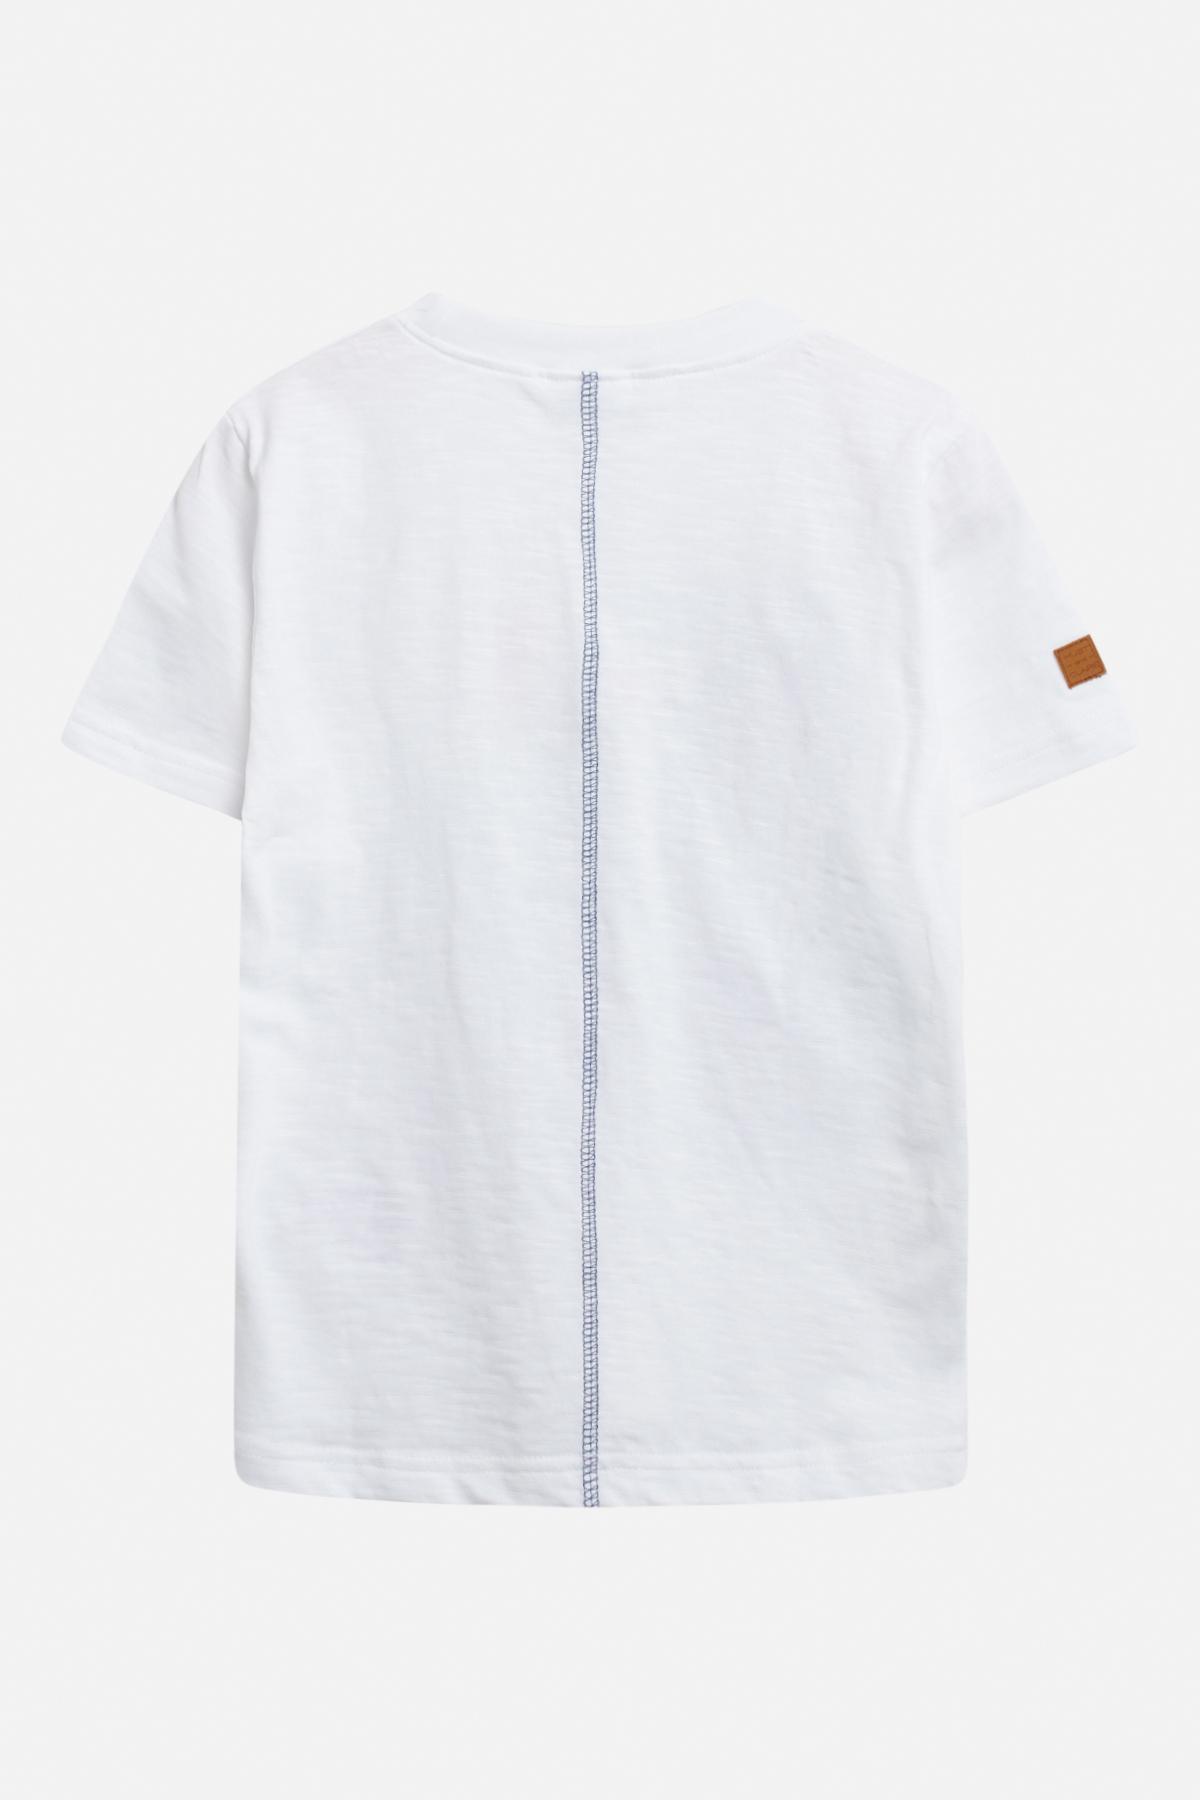 Boy - Angus - T-shirt S/S